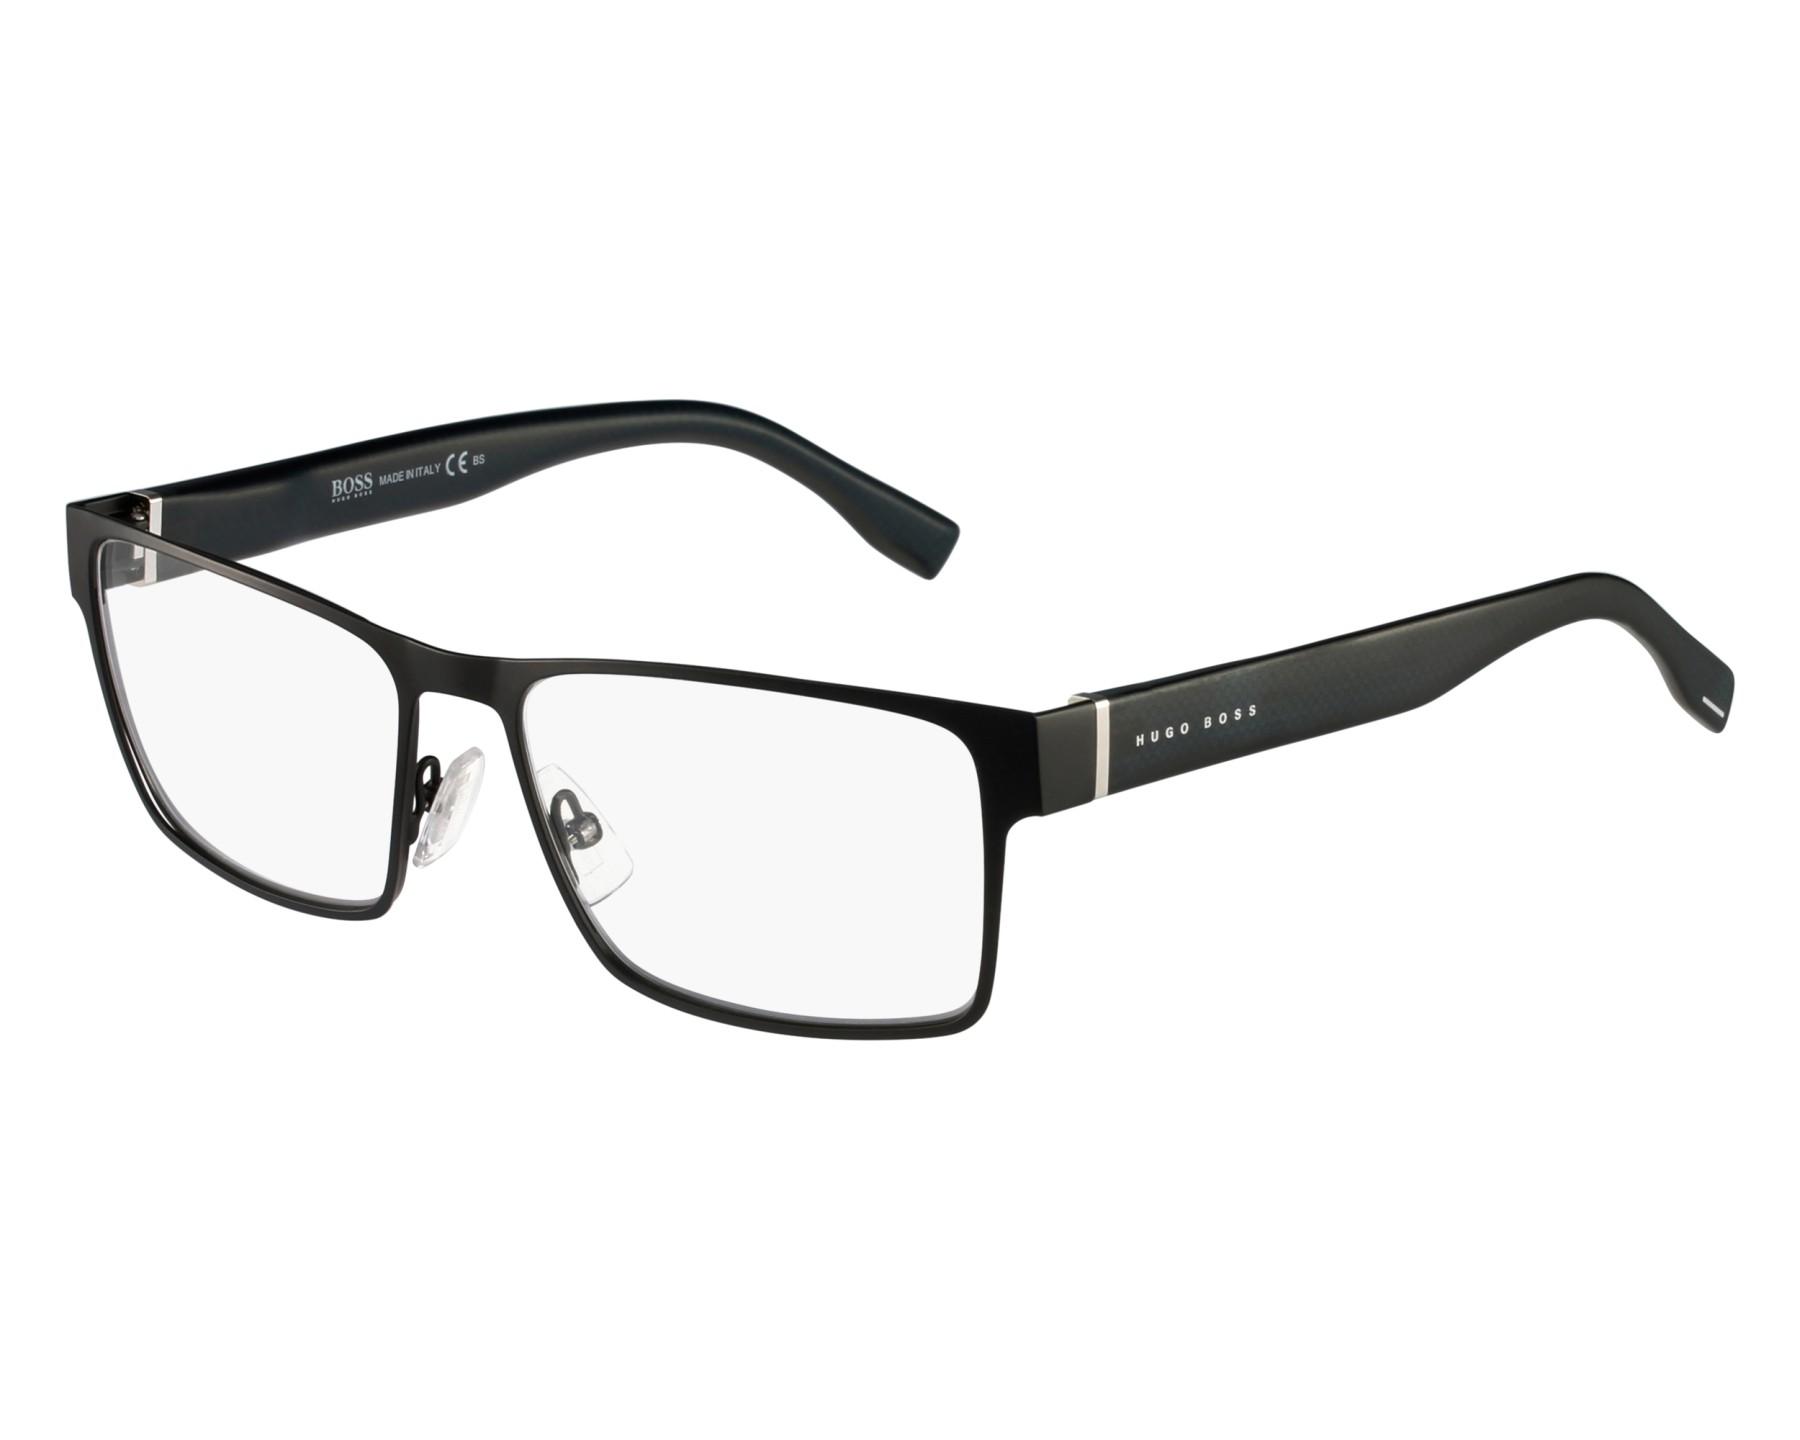 Hugo Boss Eyeglasses Black BOSS-0730 K9B - Visionet US